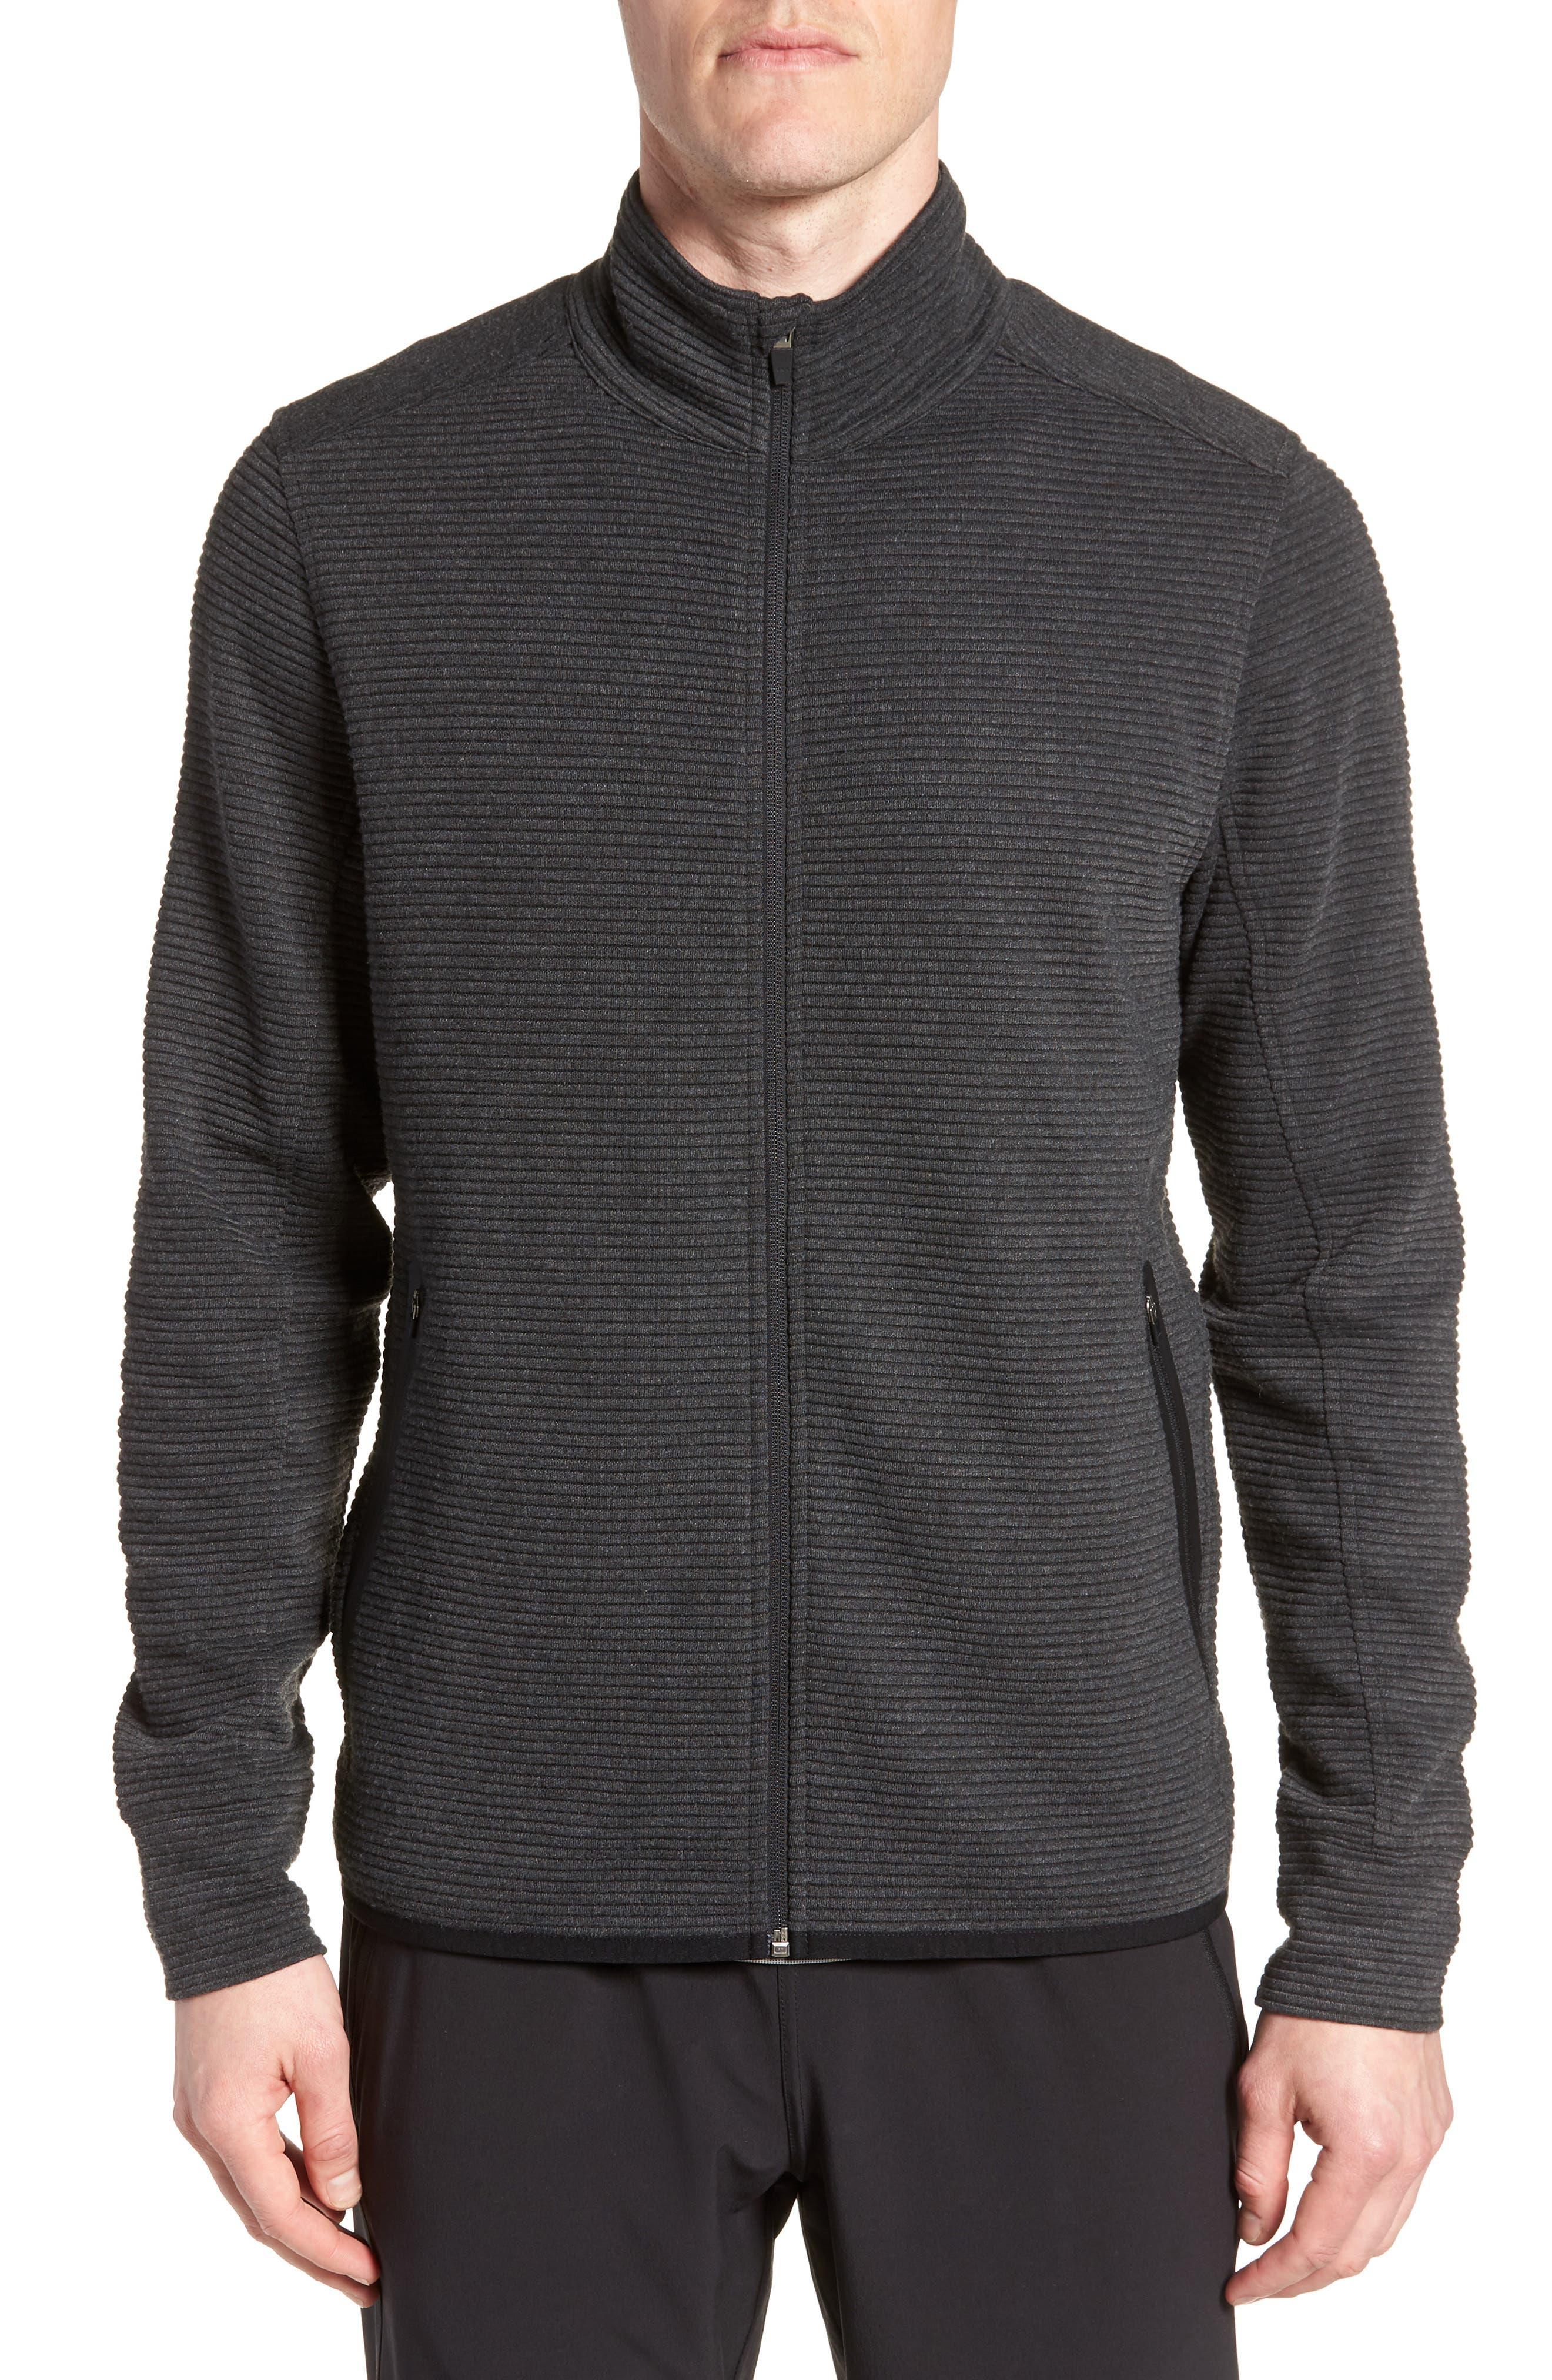 Taenite FZ High Neck Jacket,                         Main,                         color, BLACK OTTOMAN STRIPE